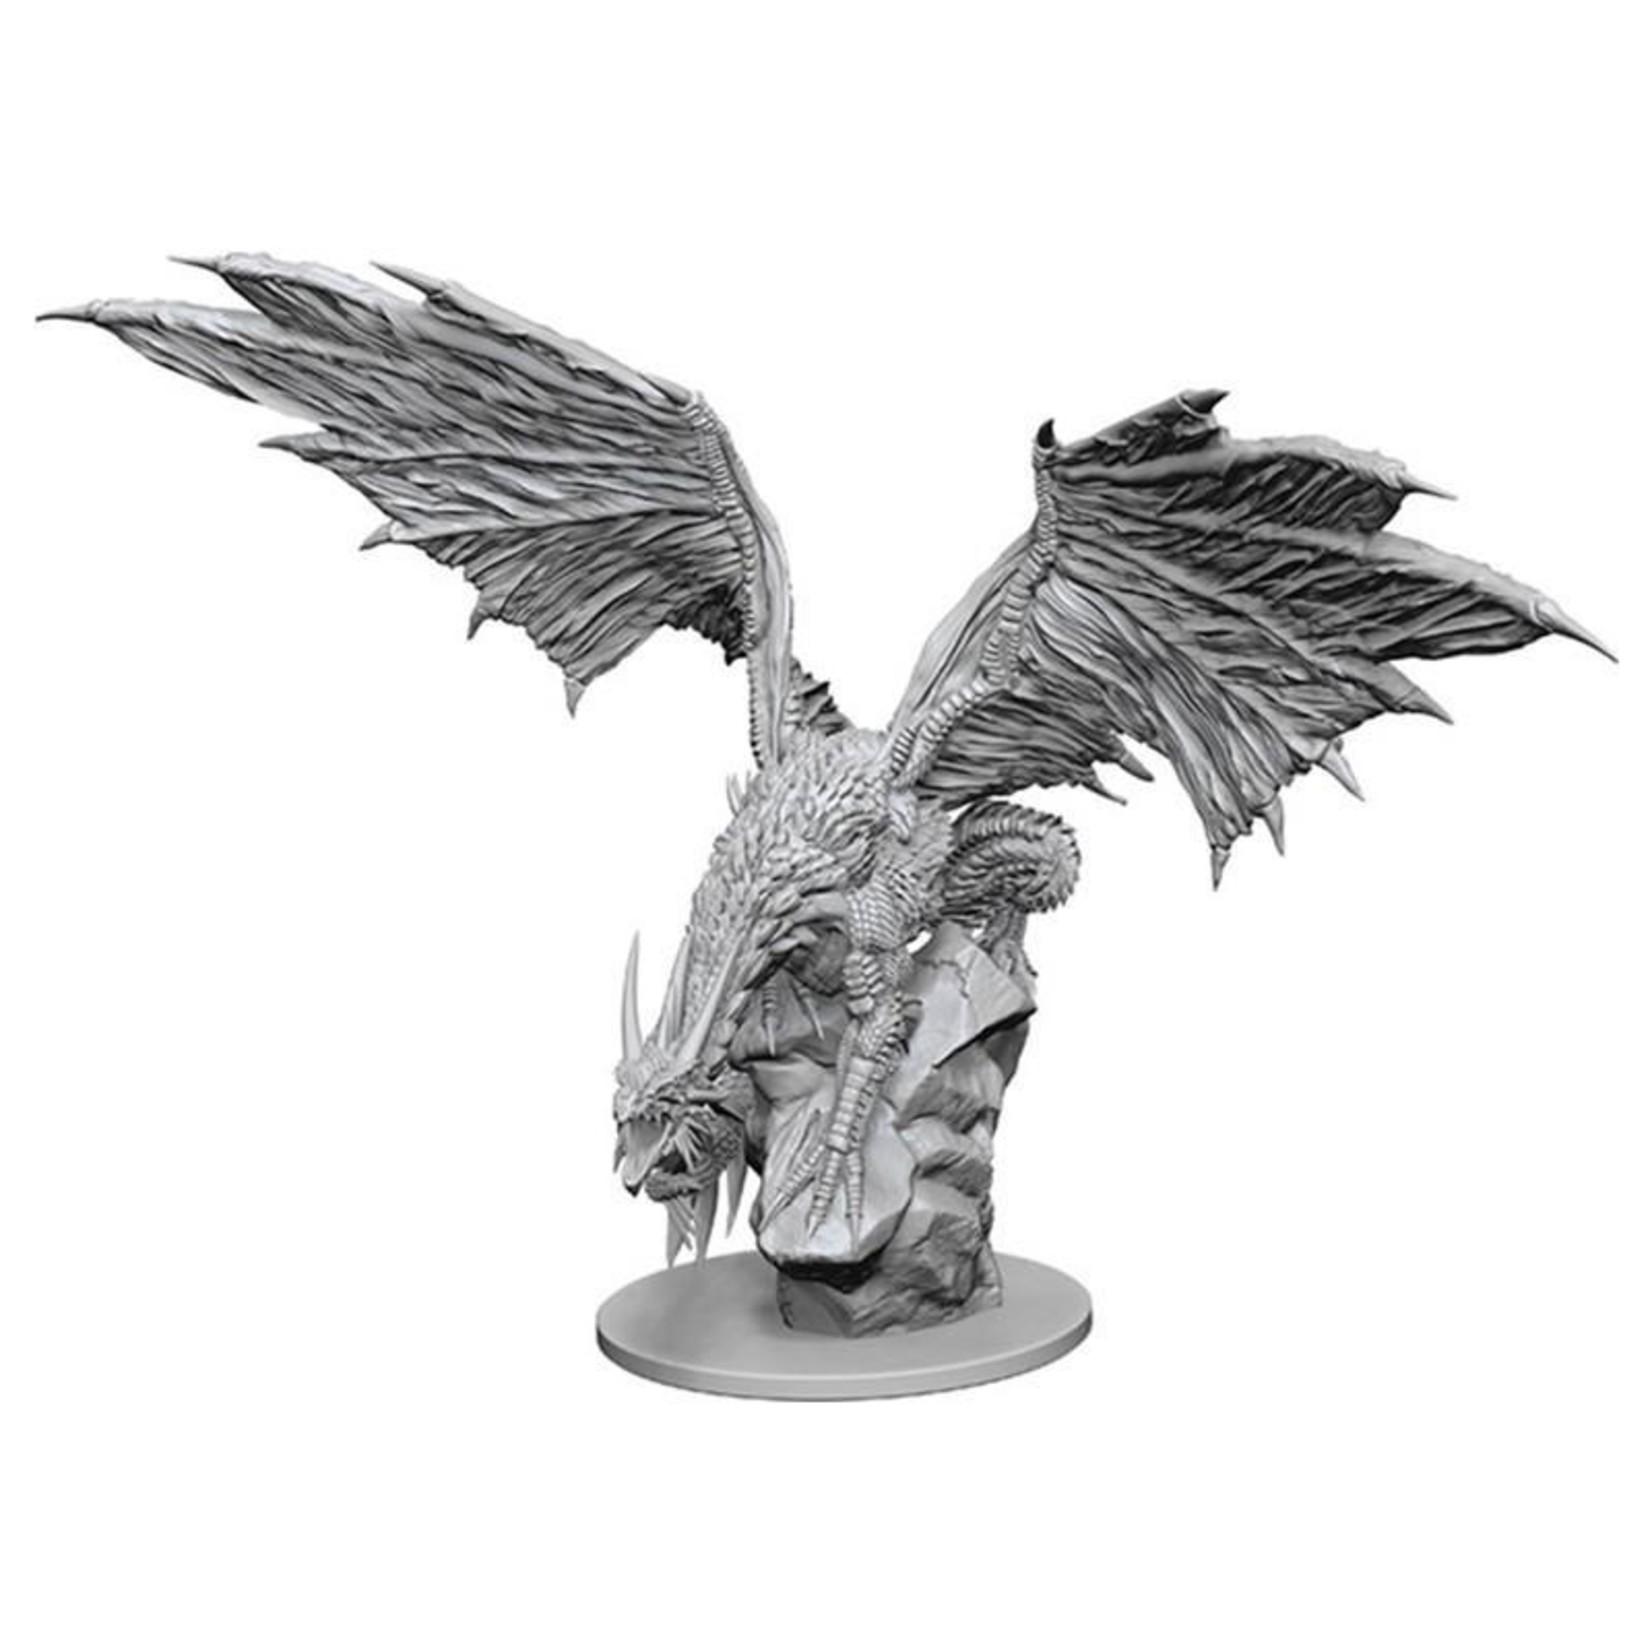 90192 Nolzur's Silver Dragon